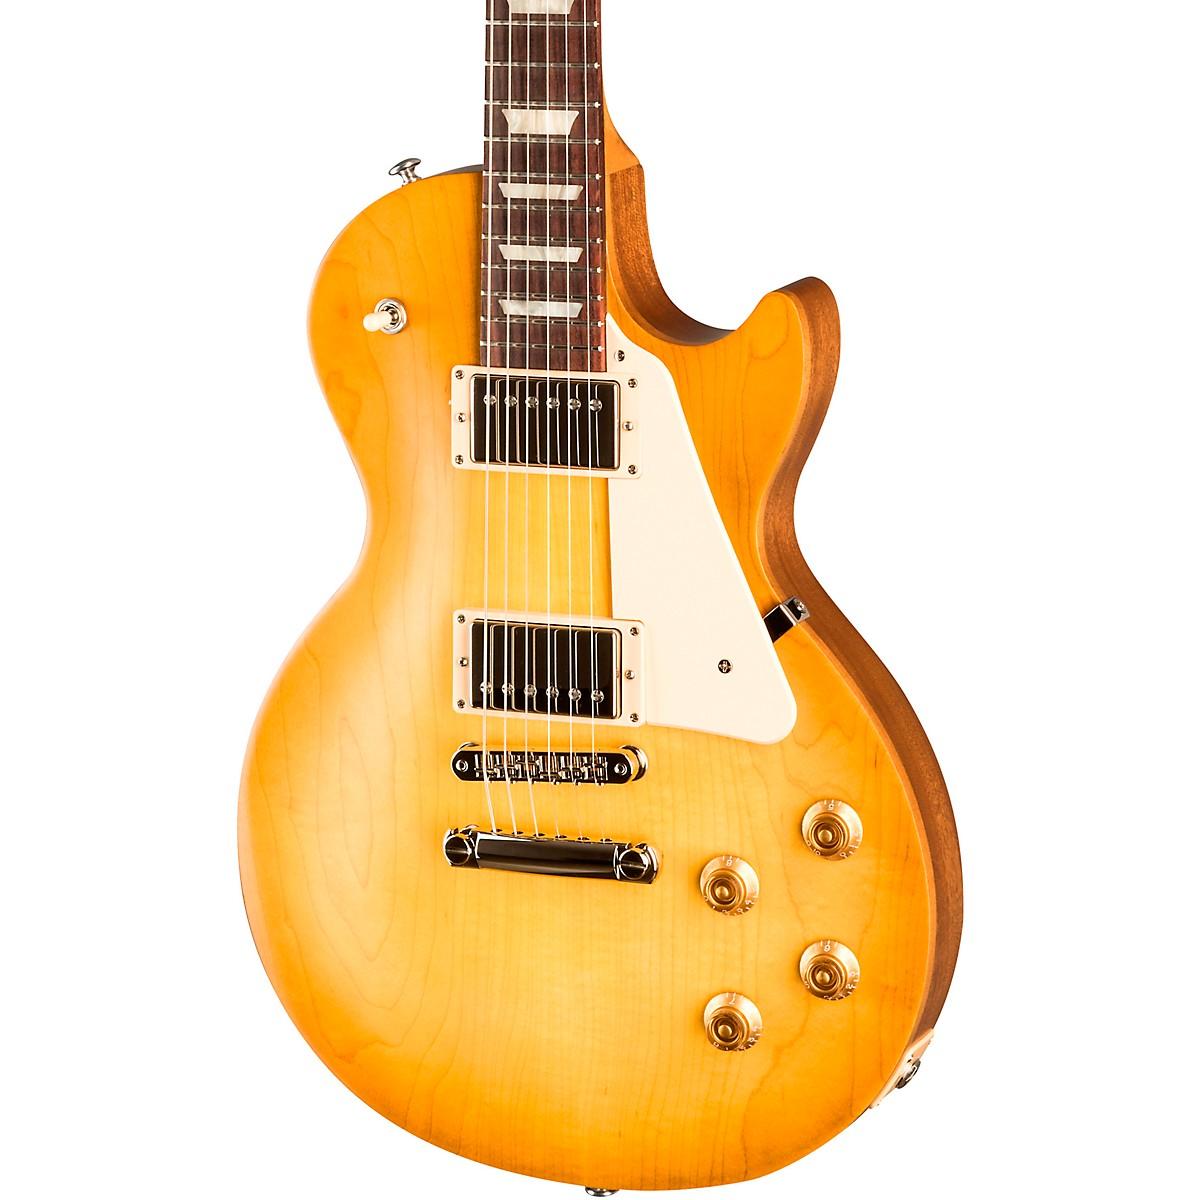 Gibson Les Paul Tribute Electric Guitar